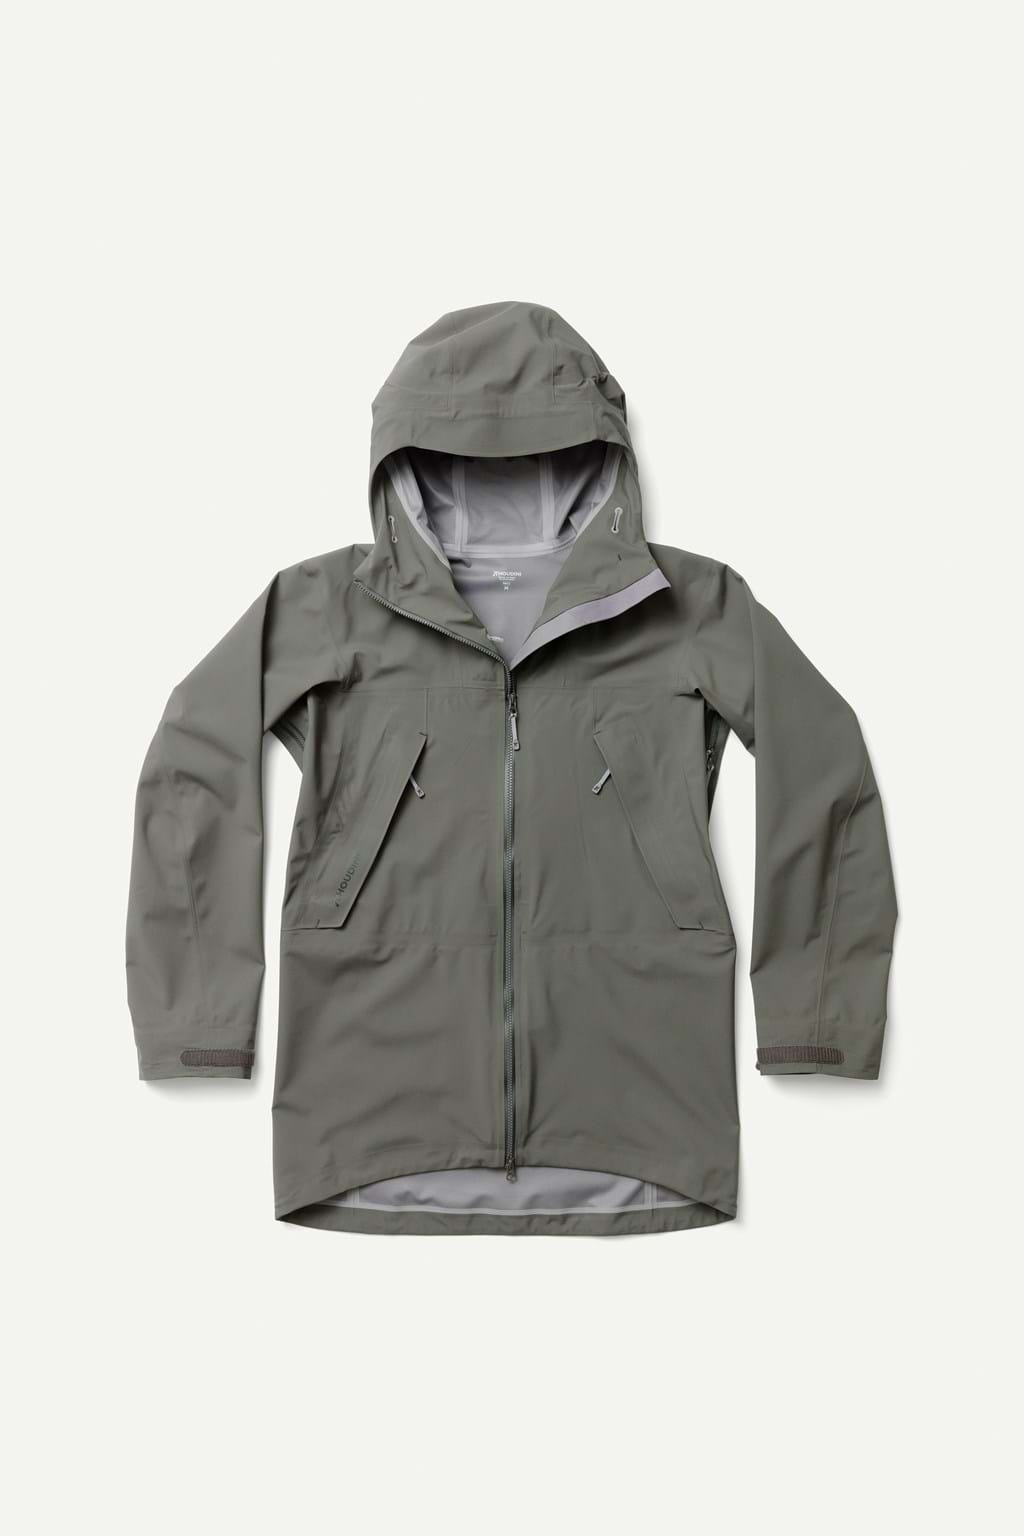 HOUDINI M's Leeward Jacket